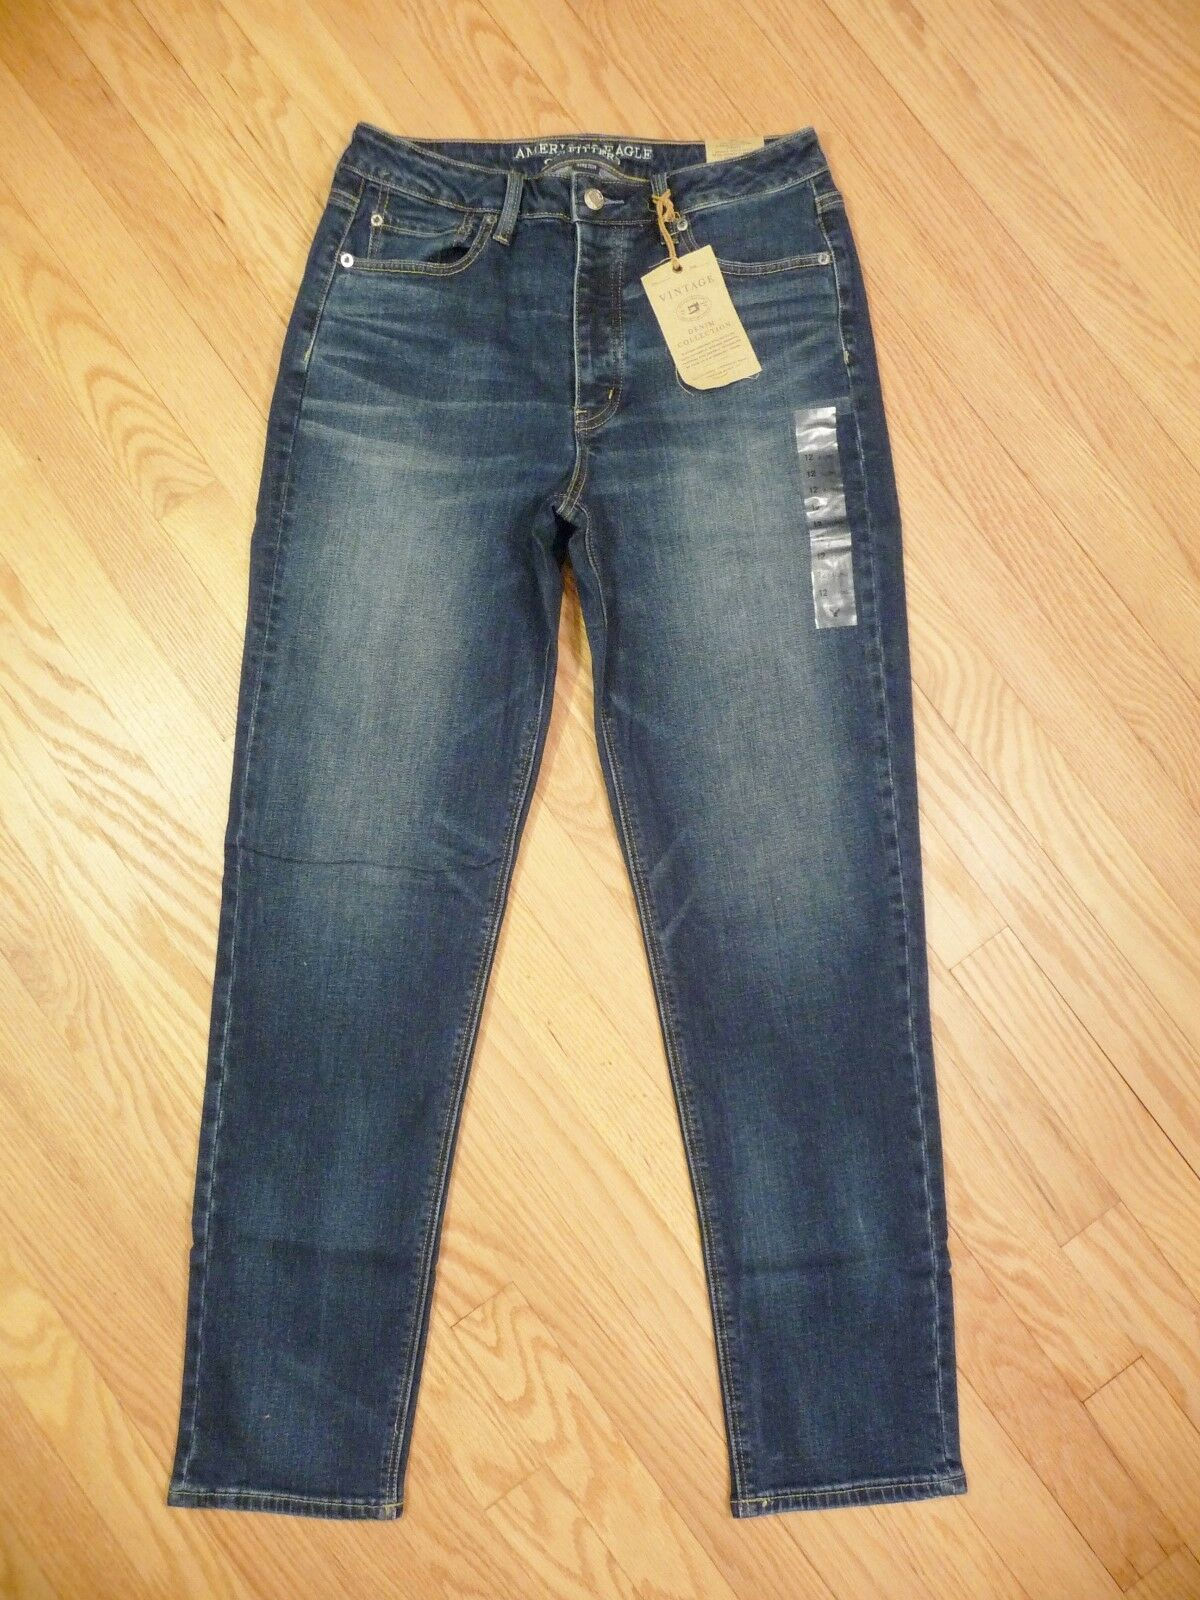 Womens NEW American Eagle Vintage Hi Rise Stretch Medium Denim Jeans 12 X-long